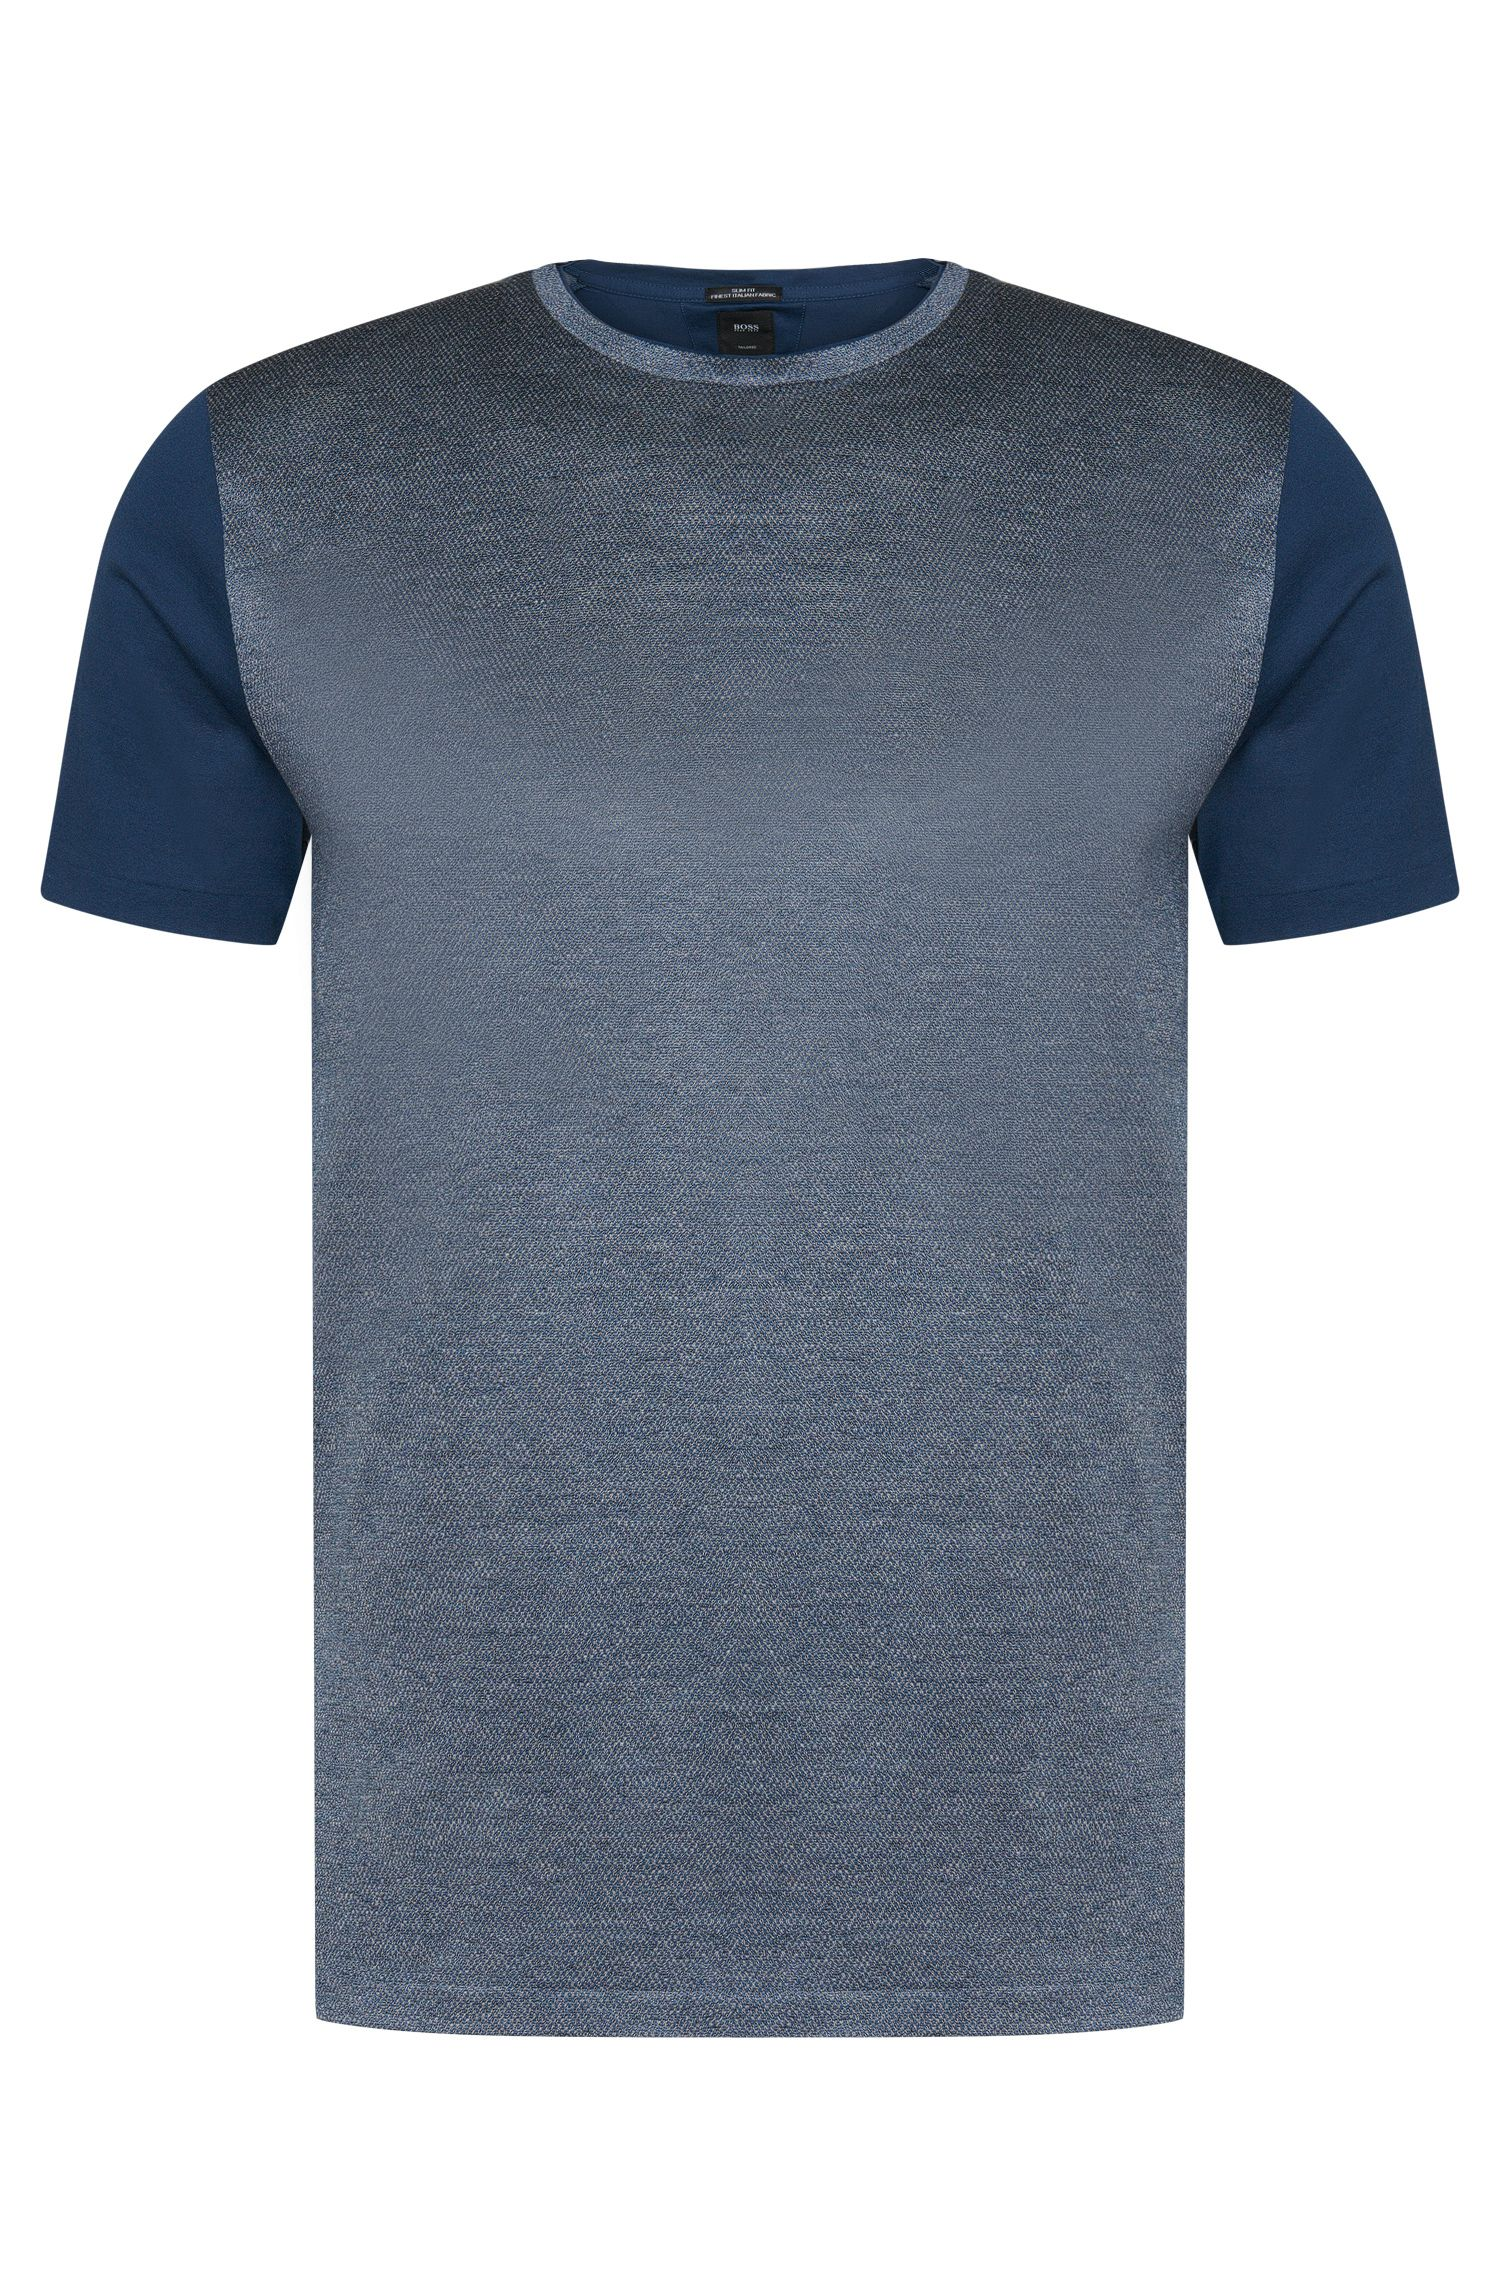 'T-Tribel' | Italian Cotton Jacquard T-Shirt